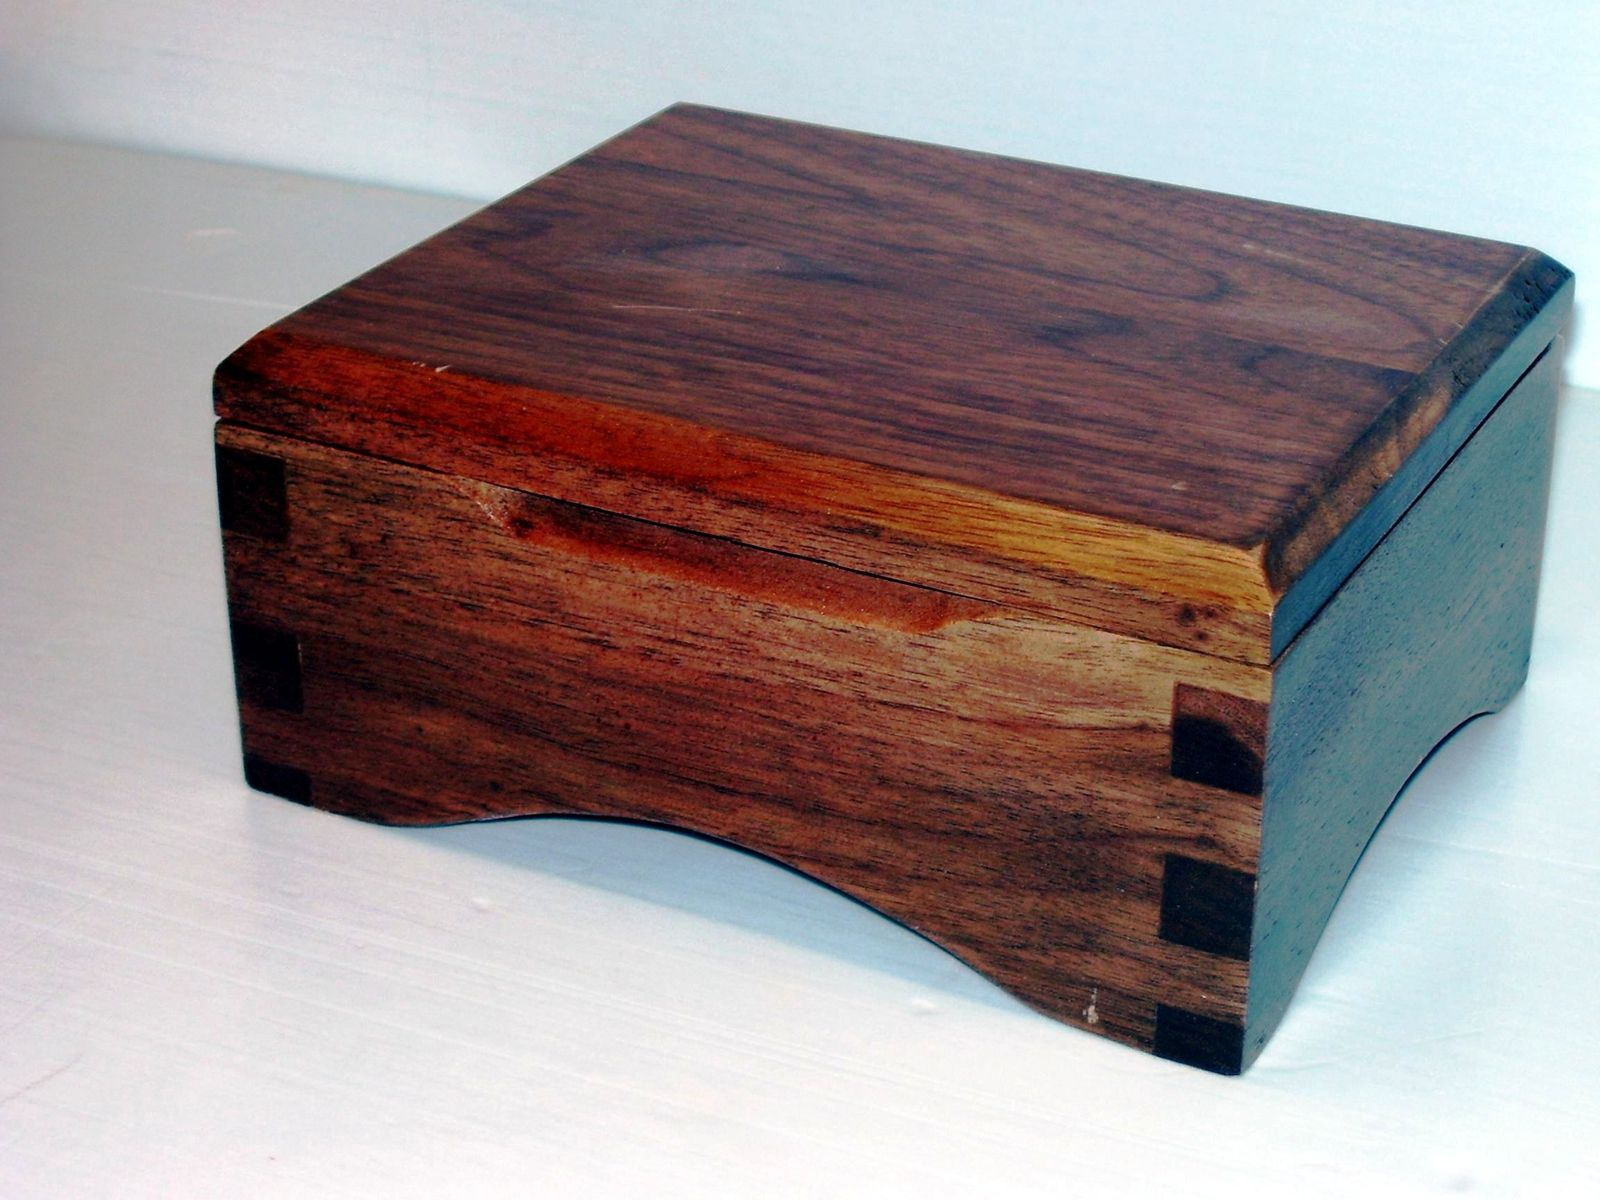 Handmade Walnut Keepsake Box By Robert Reda Woodworking